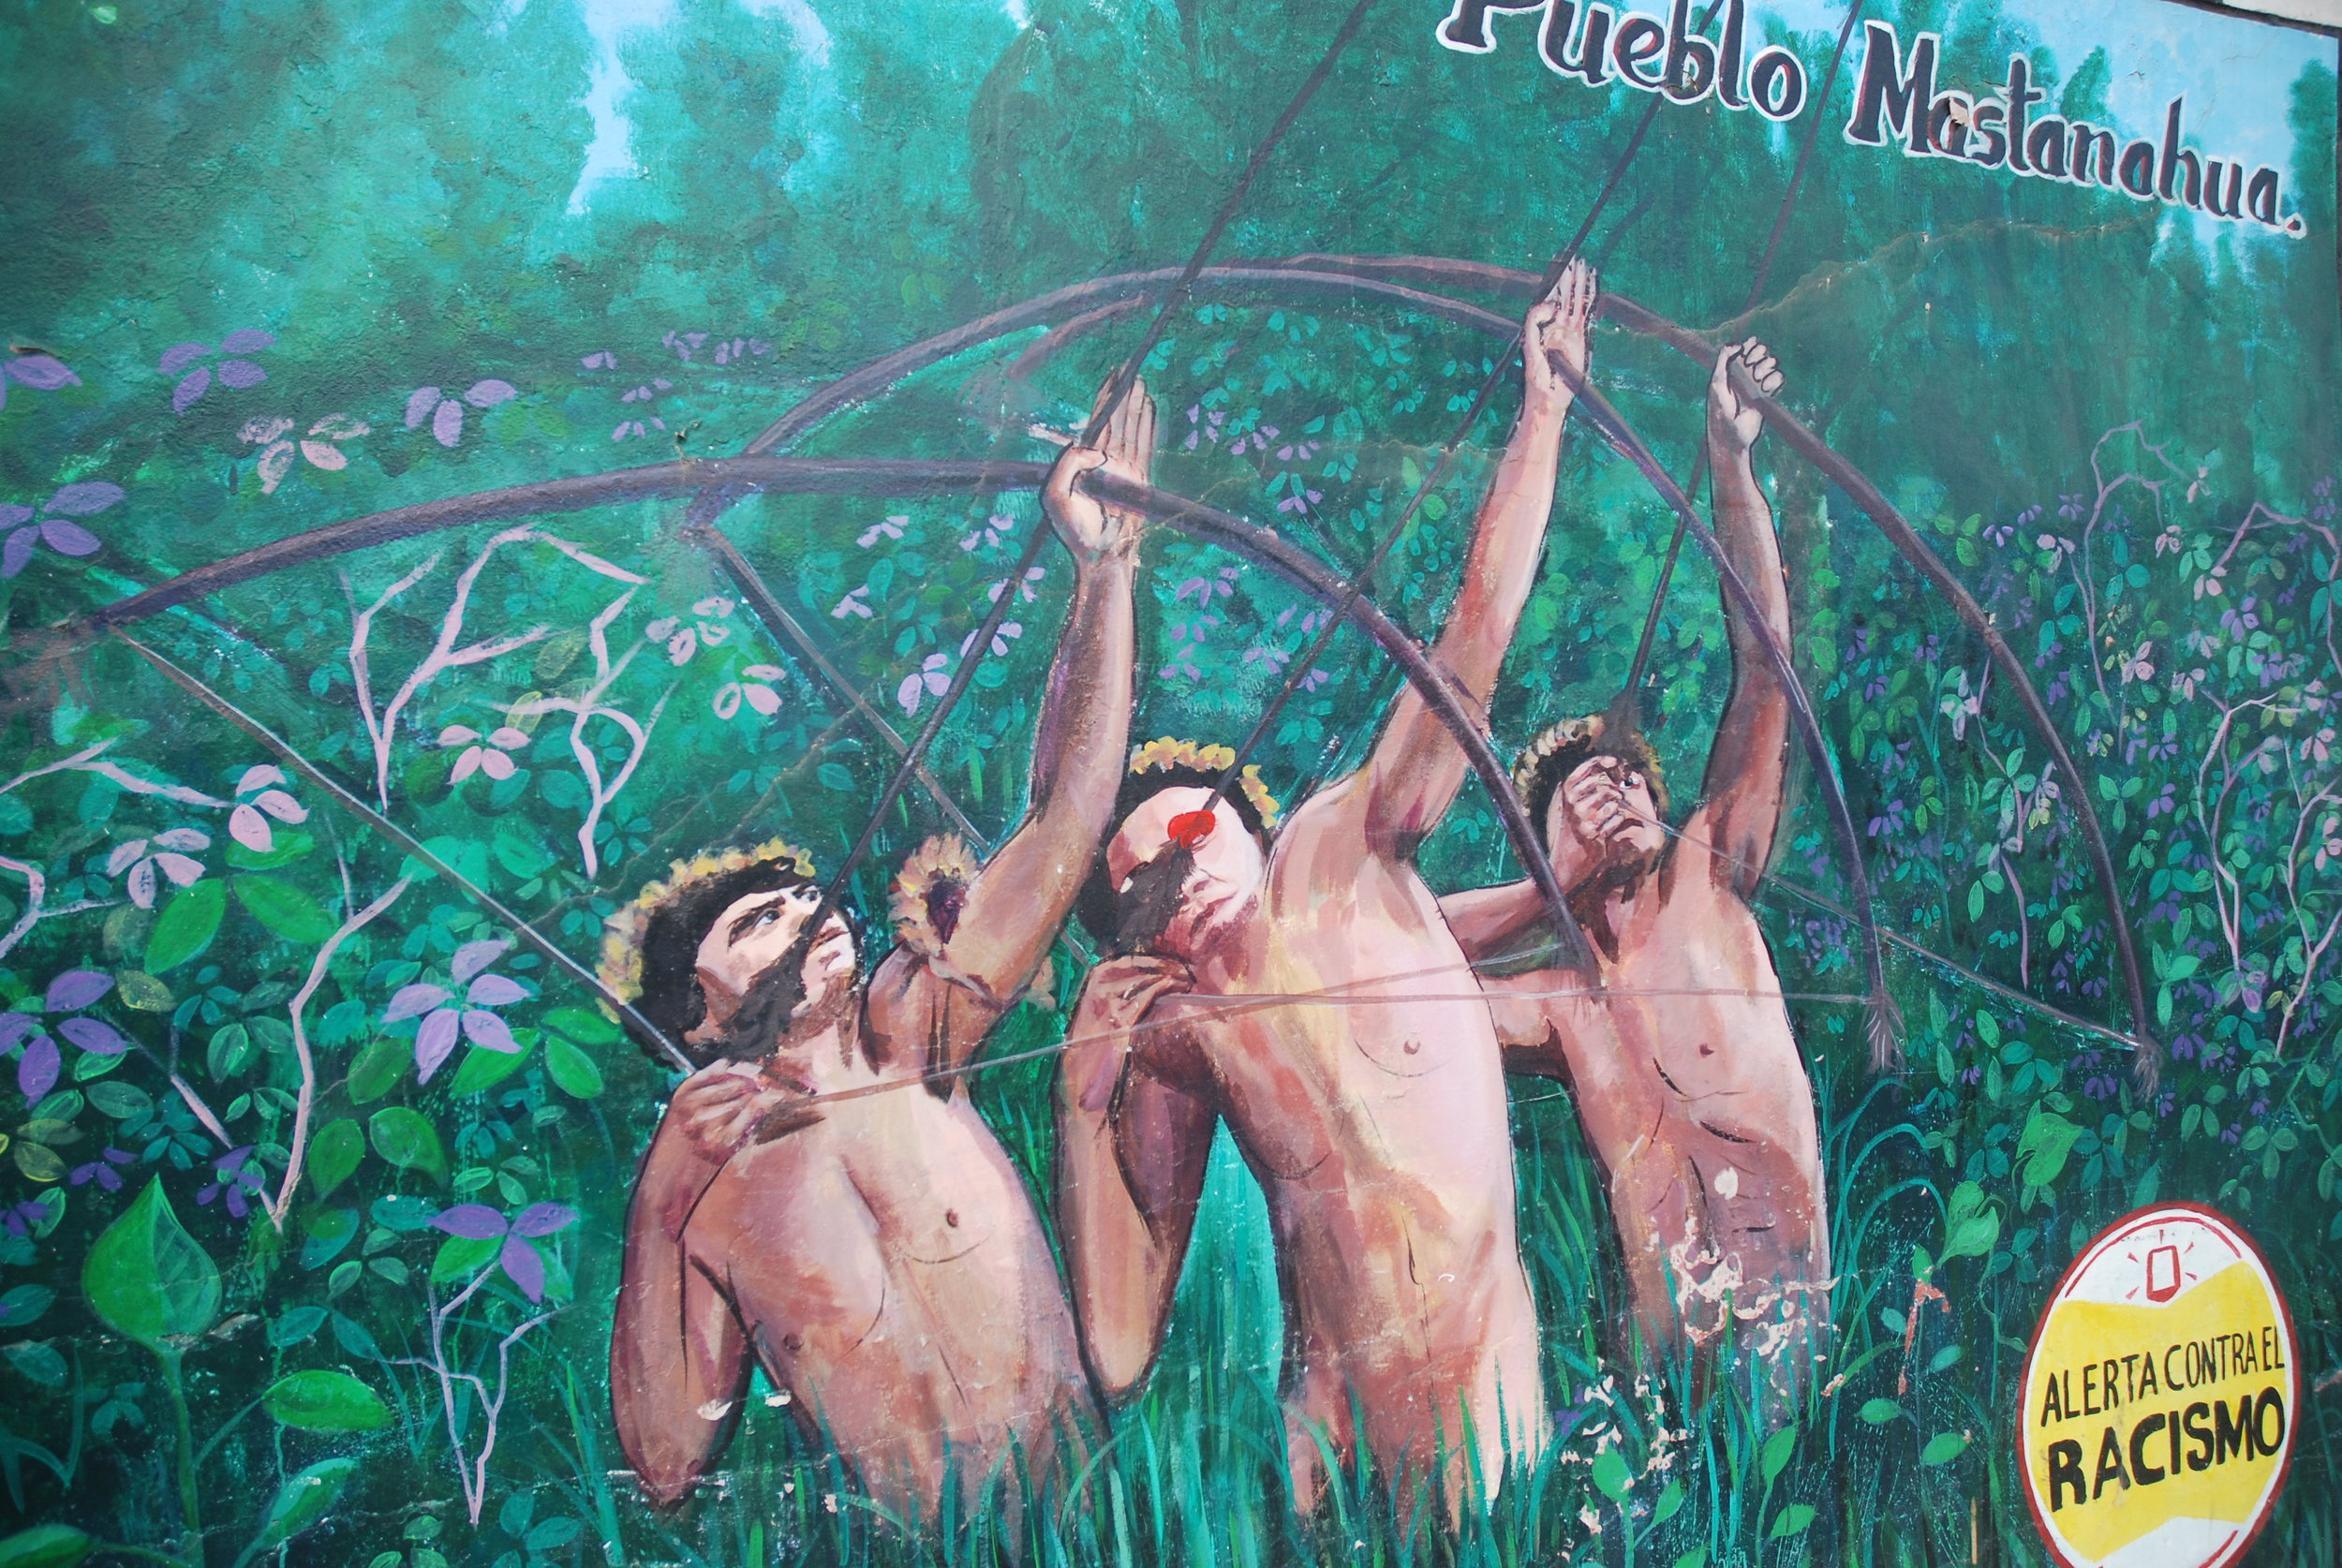 The Guardian - Does European coke habit mean massacring 'uncontacted' indigenous people?